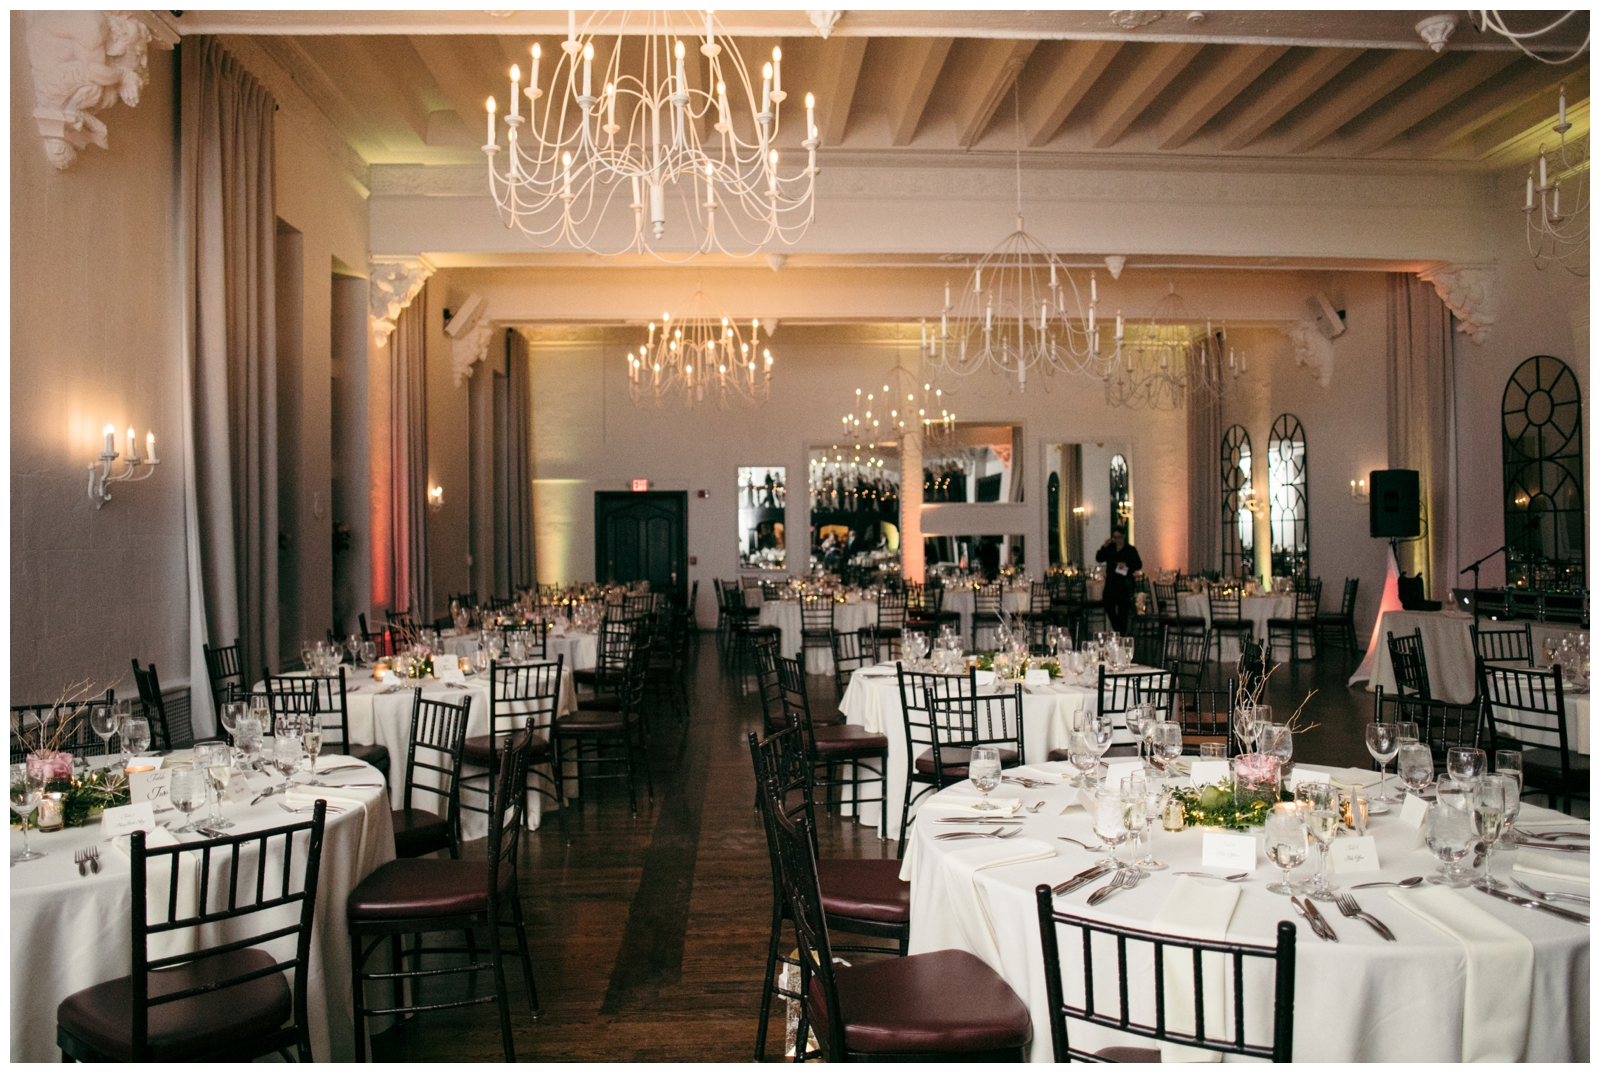 Alden-Castle-Wedding-Boston-Bailey-Q-Photo-044.jpg